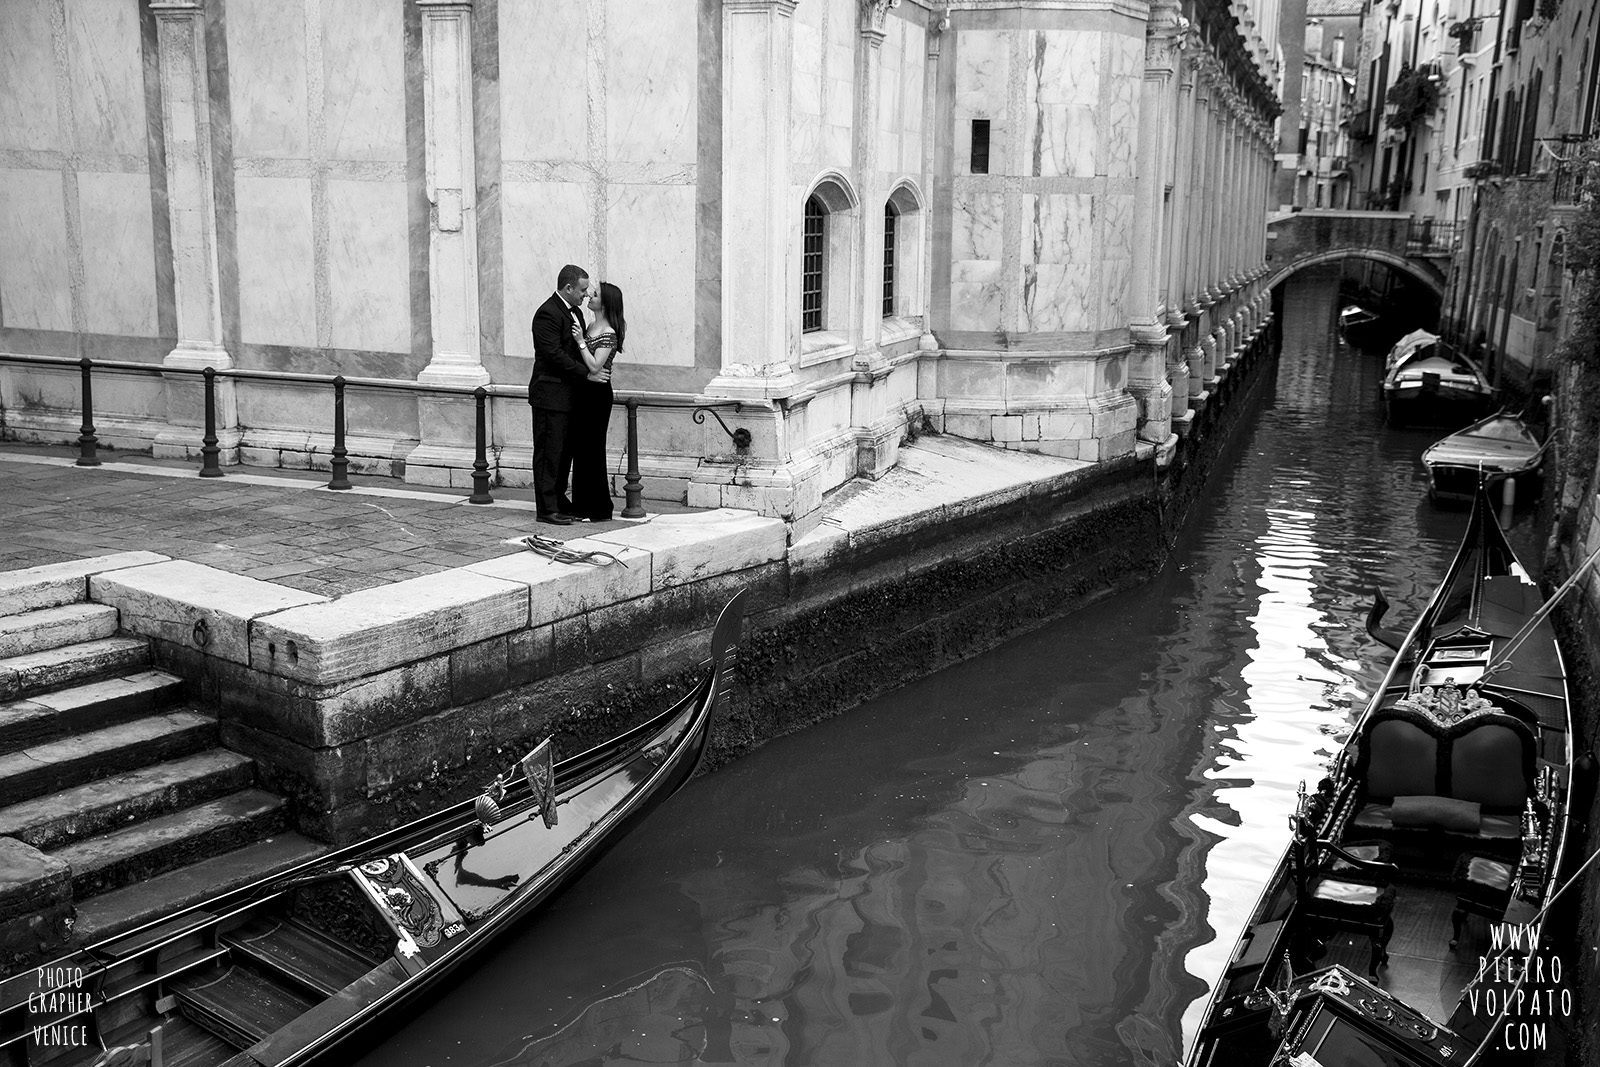 pre-wedding-love-story-photoshoot-in-venice-italy-photographer-pietro-volpato-20161229_07